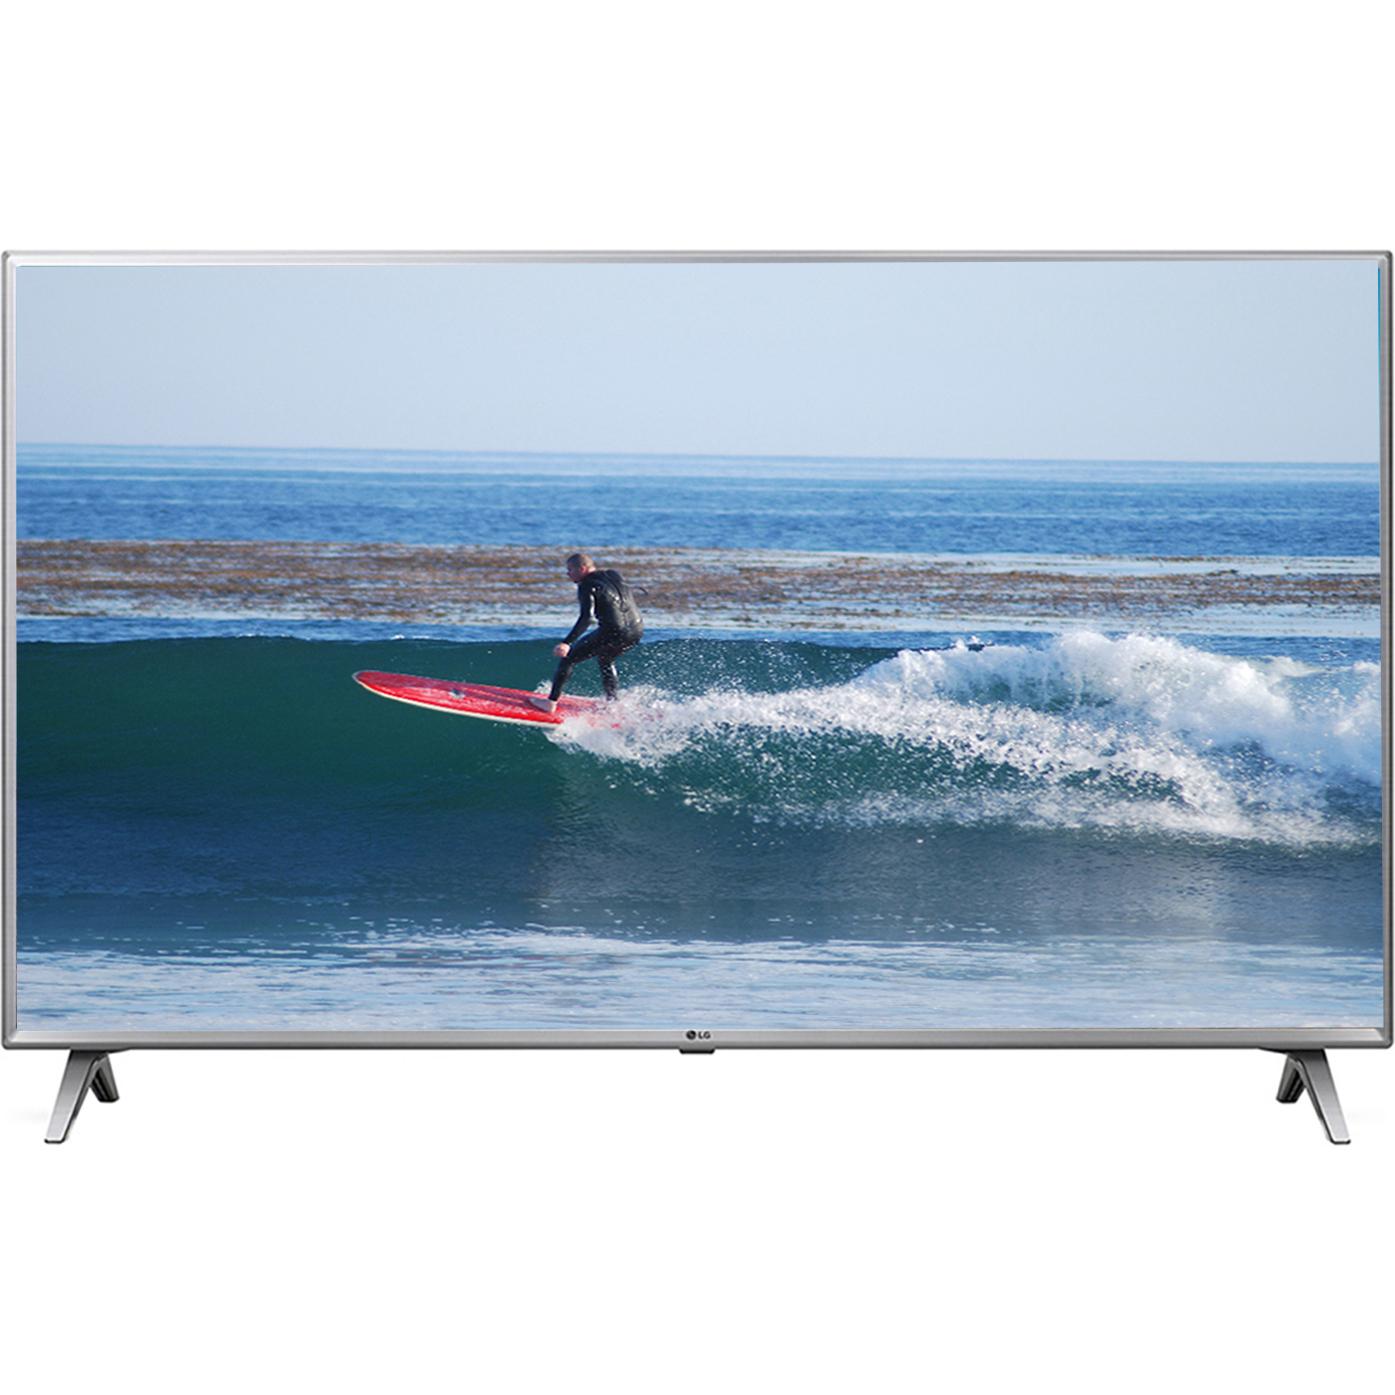 "Refurbished LG 50"" 4K Smart UHD HDR LED TV, 50UK6500"